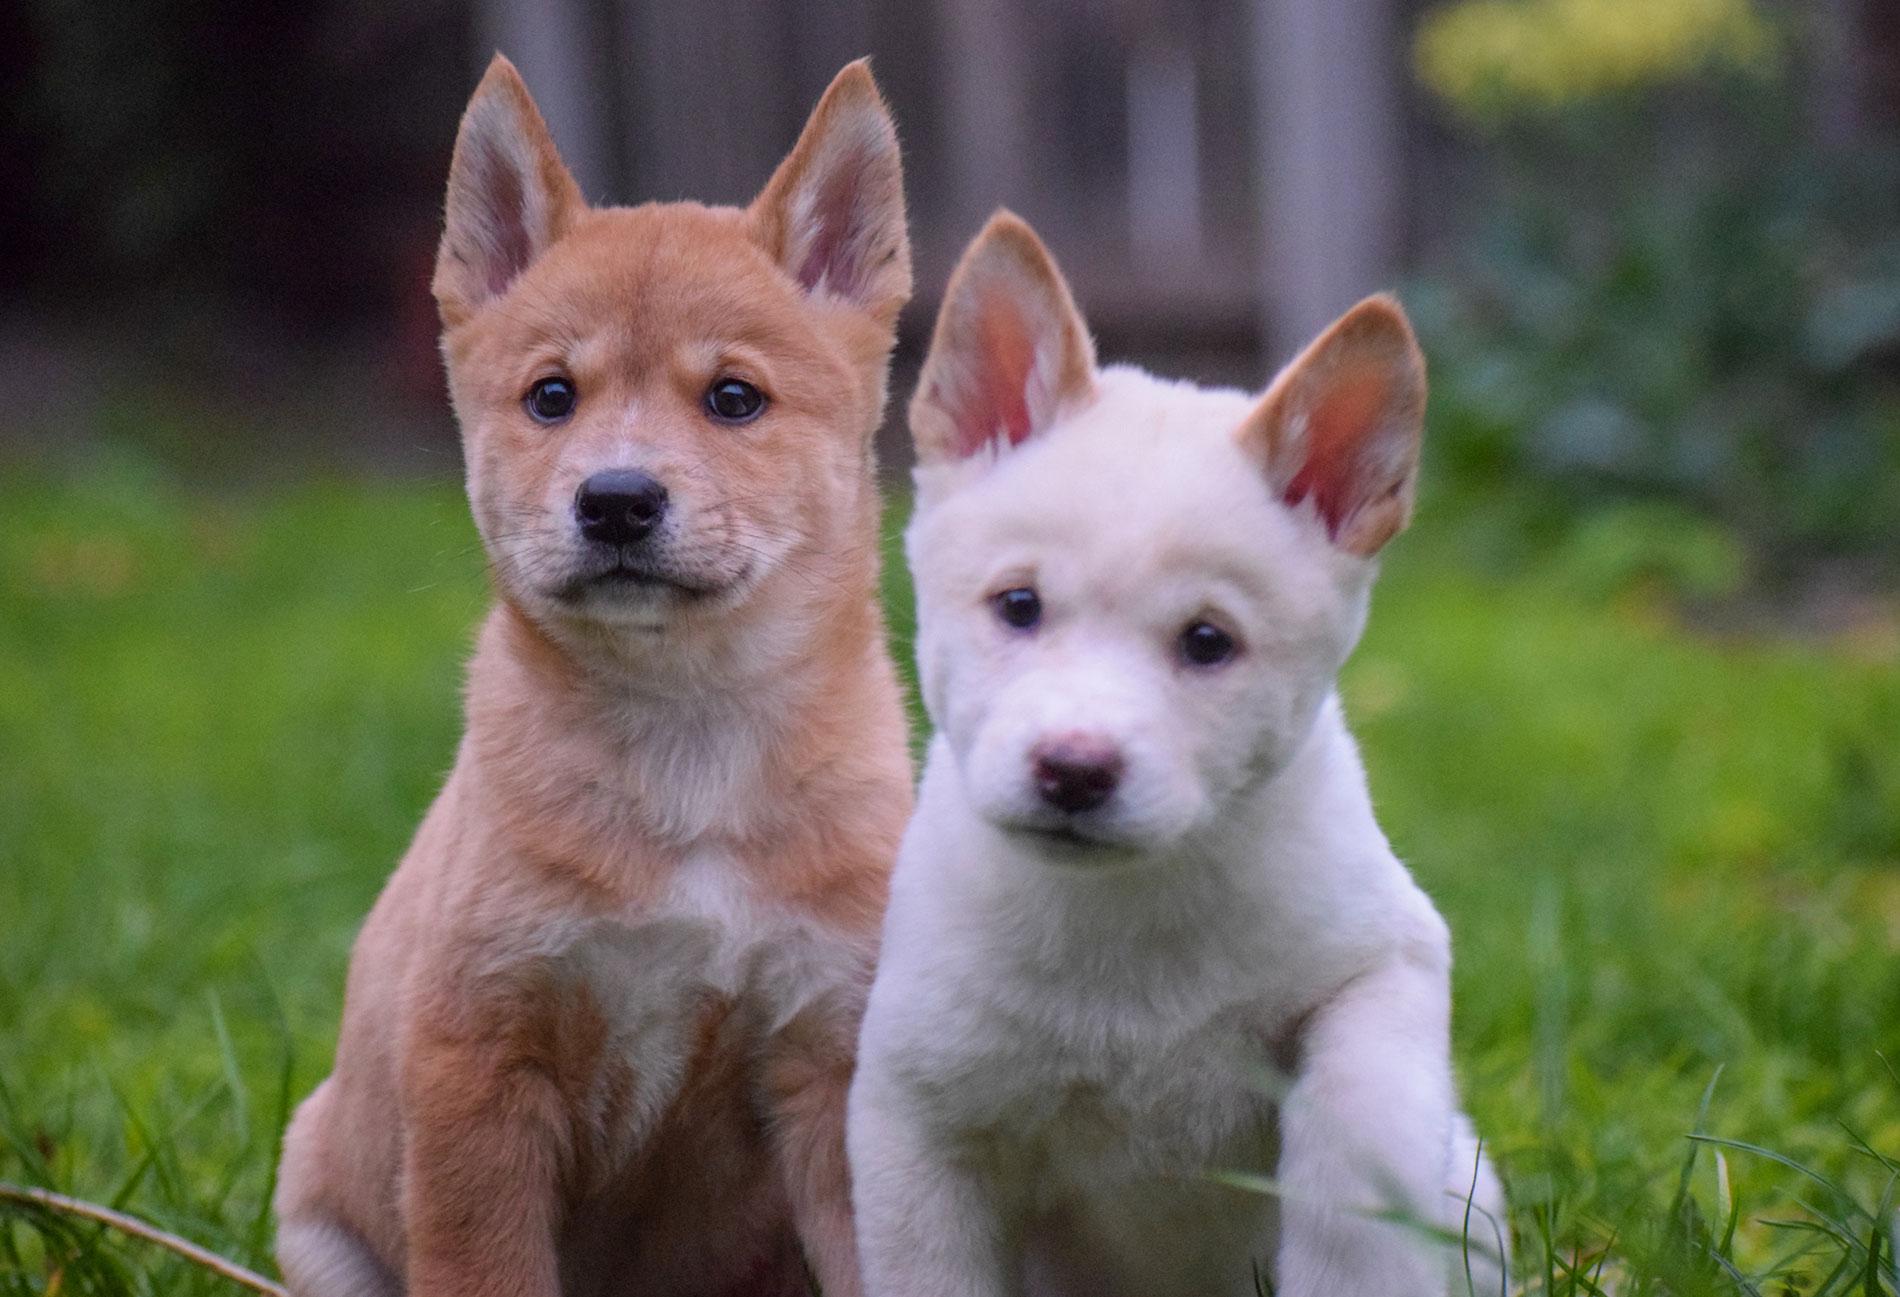 Dingo puppies at Moonlit Sanctuary Wildlife Park